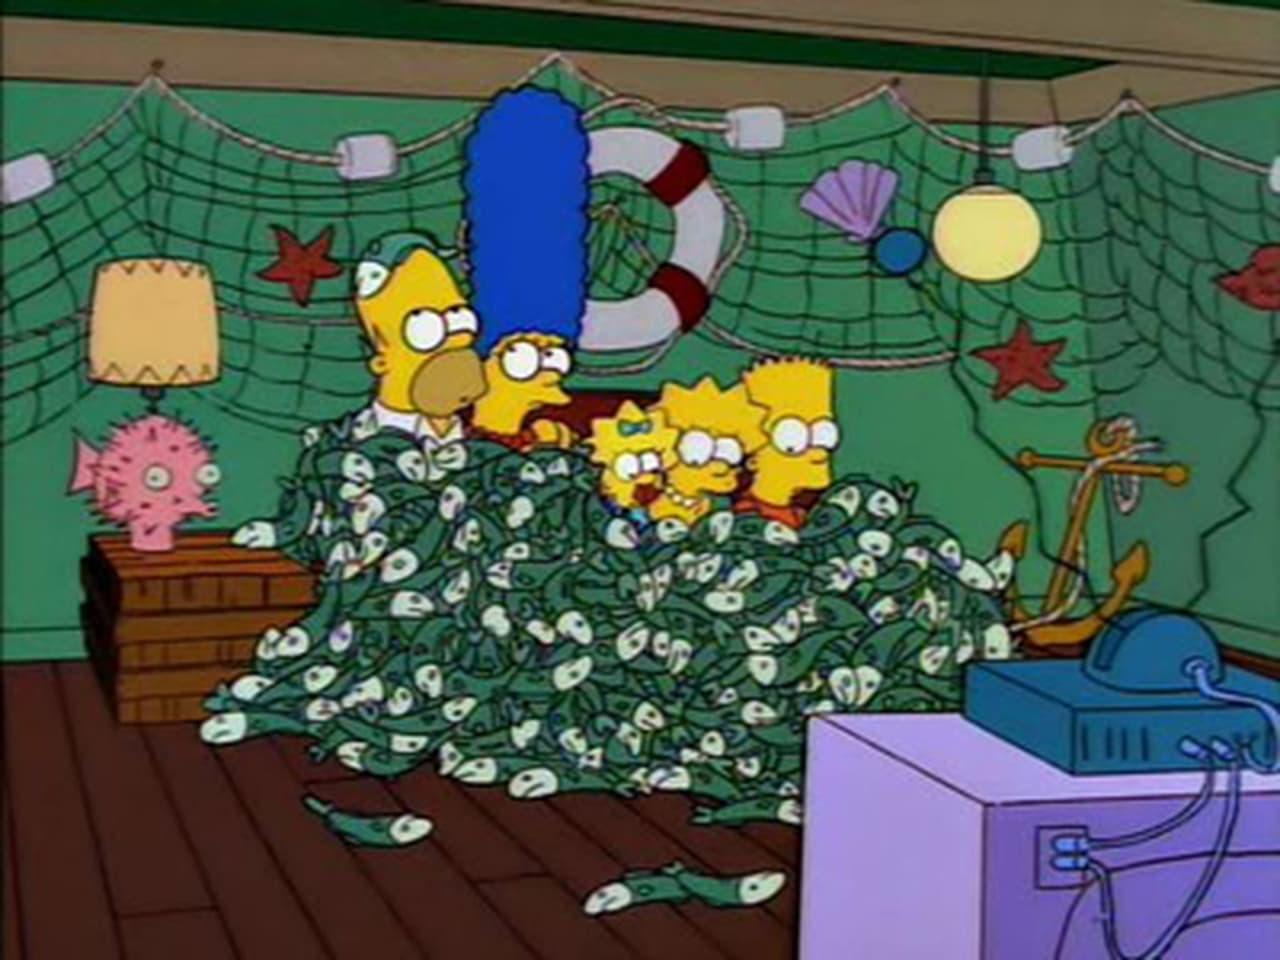 The Simpsons - Season 5 Episode 2 : Cape Feare